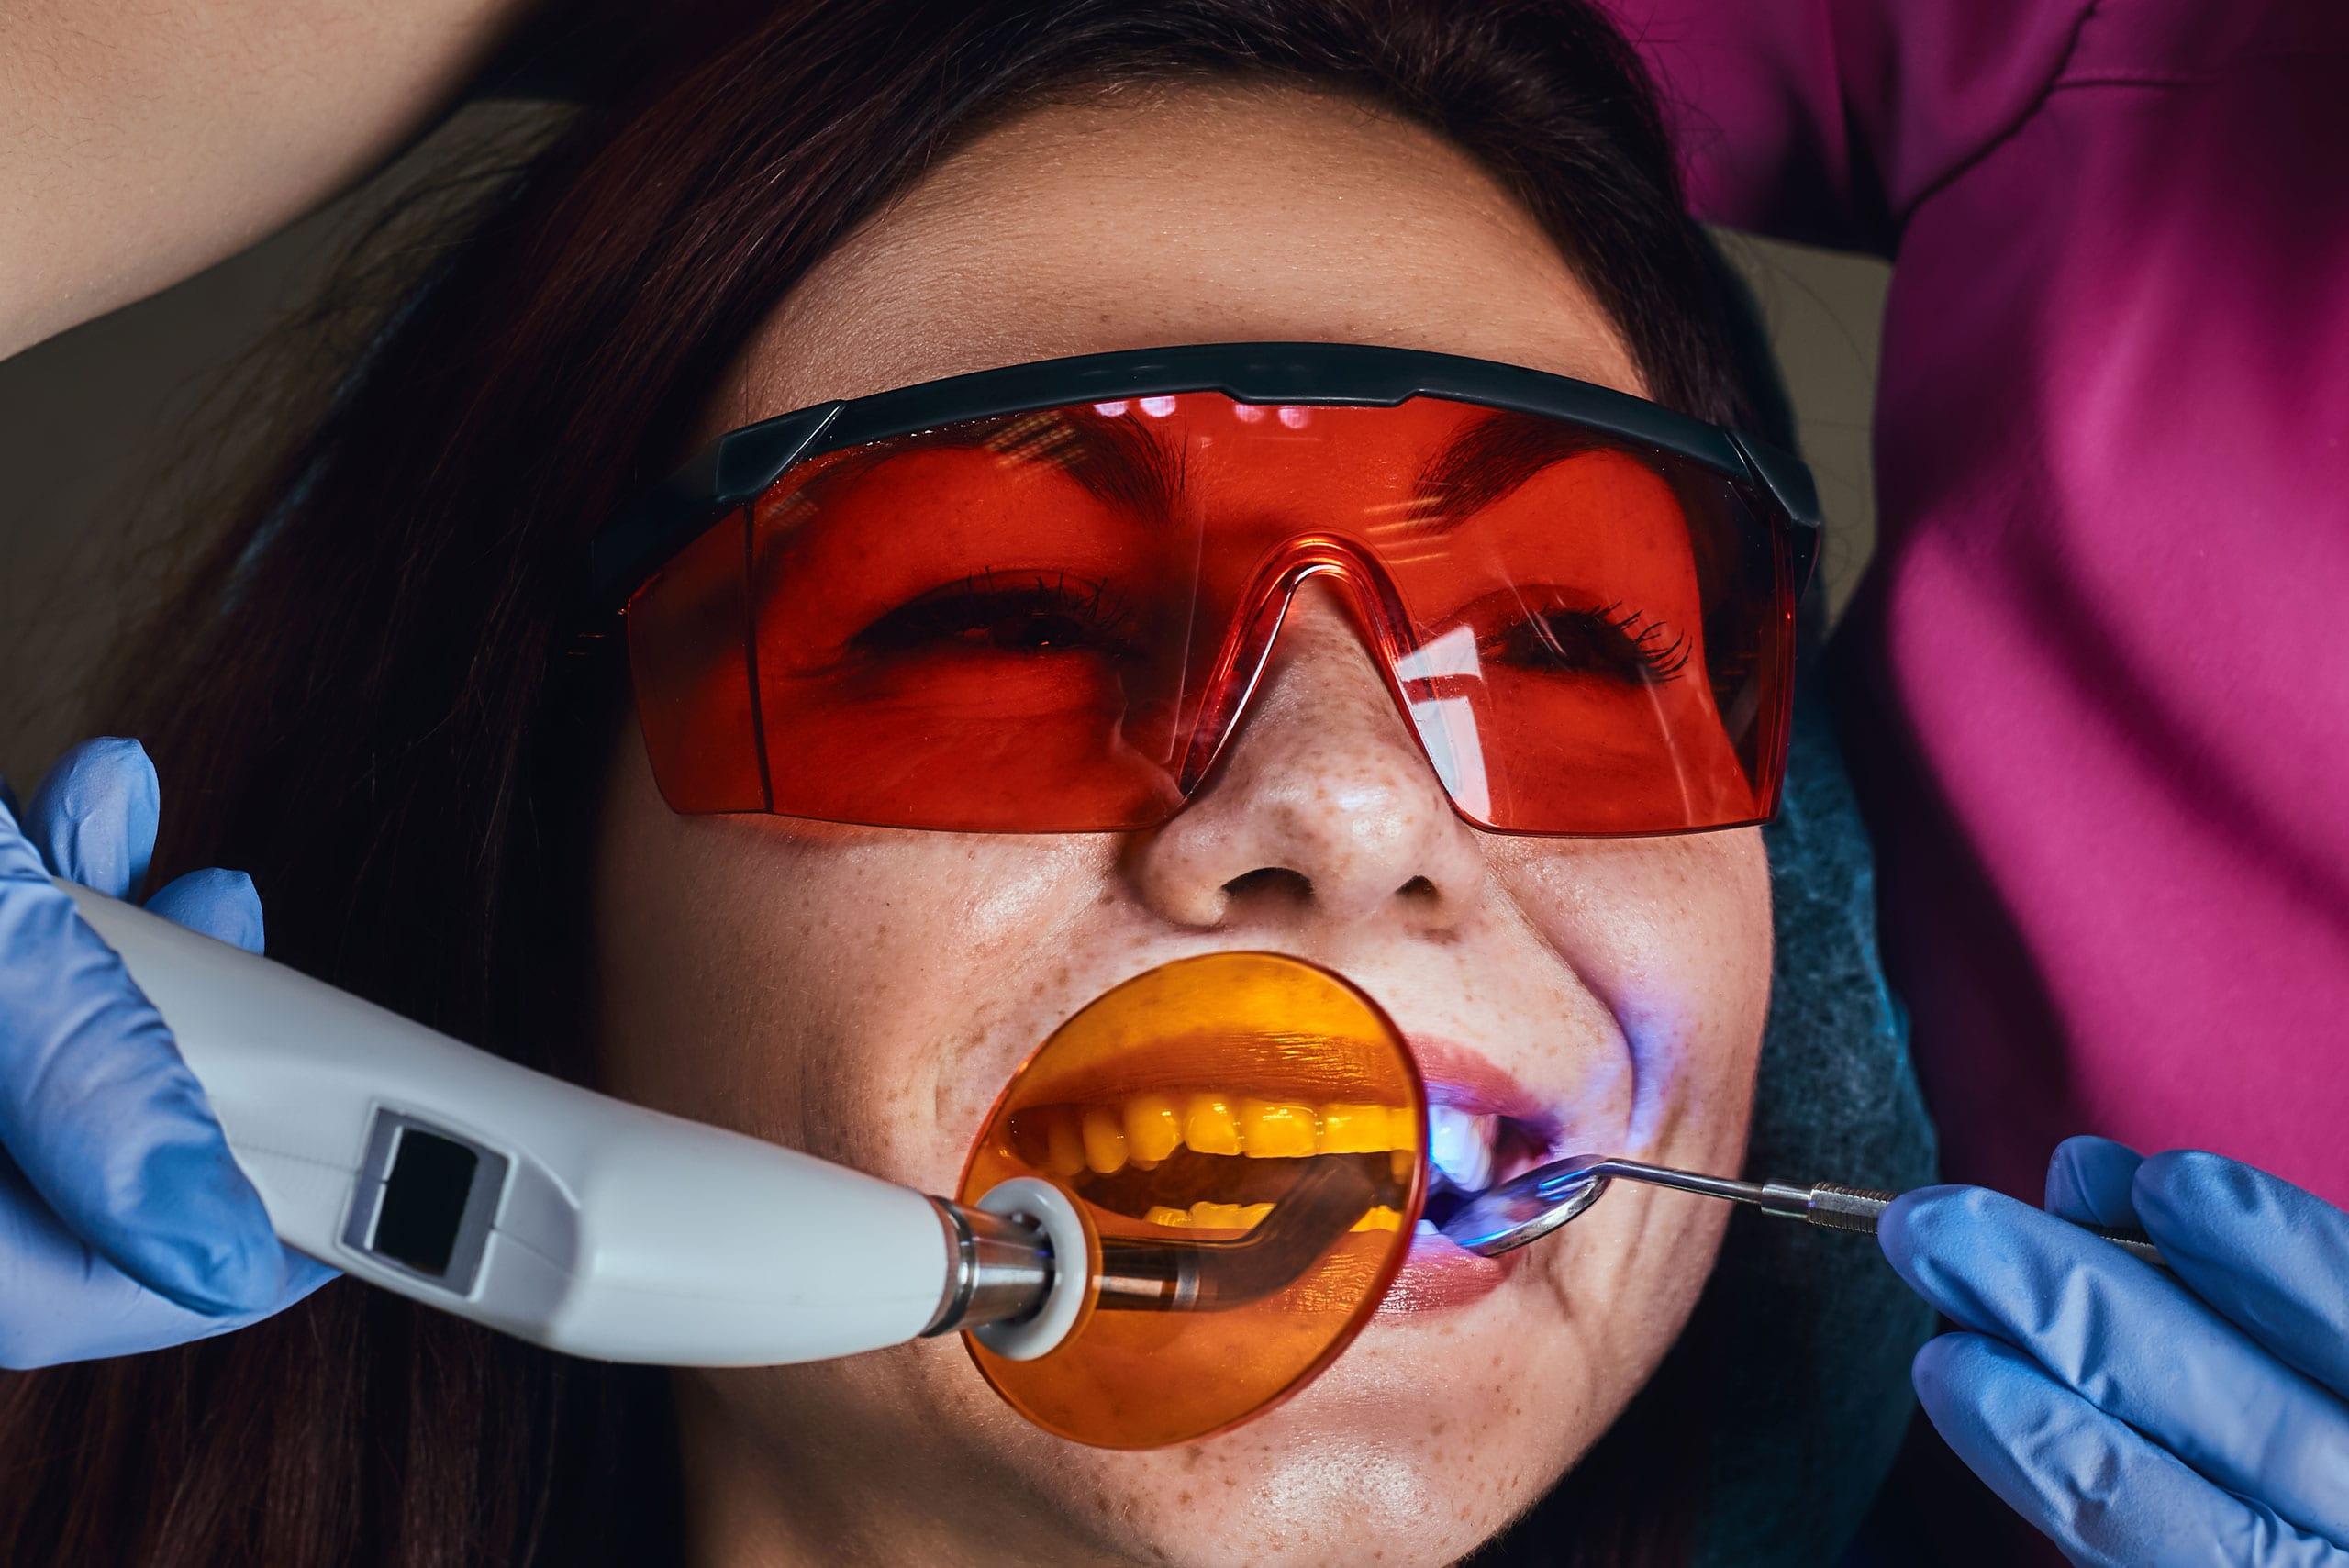 Tooth Bonding - Central Austin Cosmetic Dentist - Treaty Oak Dental